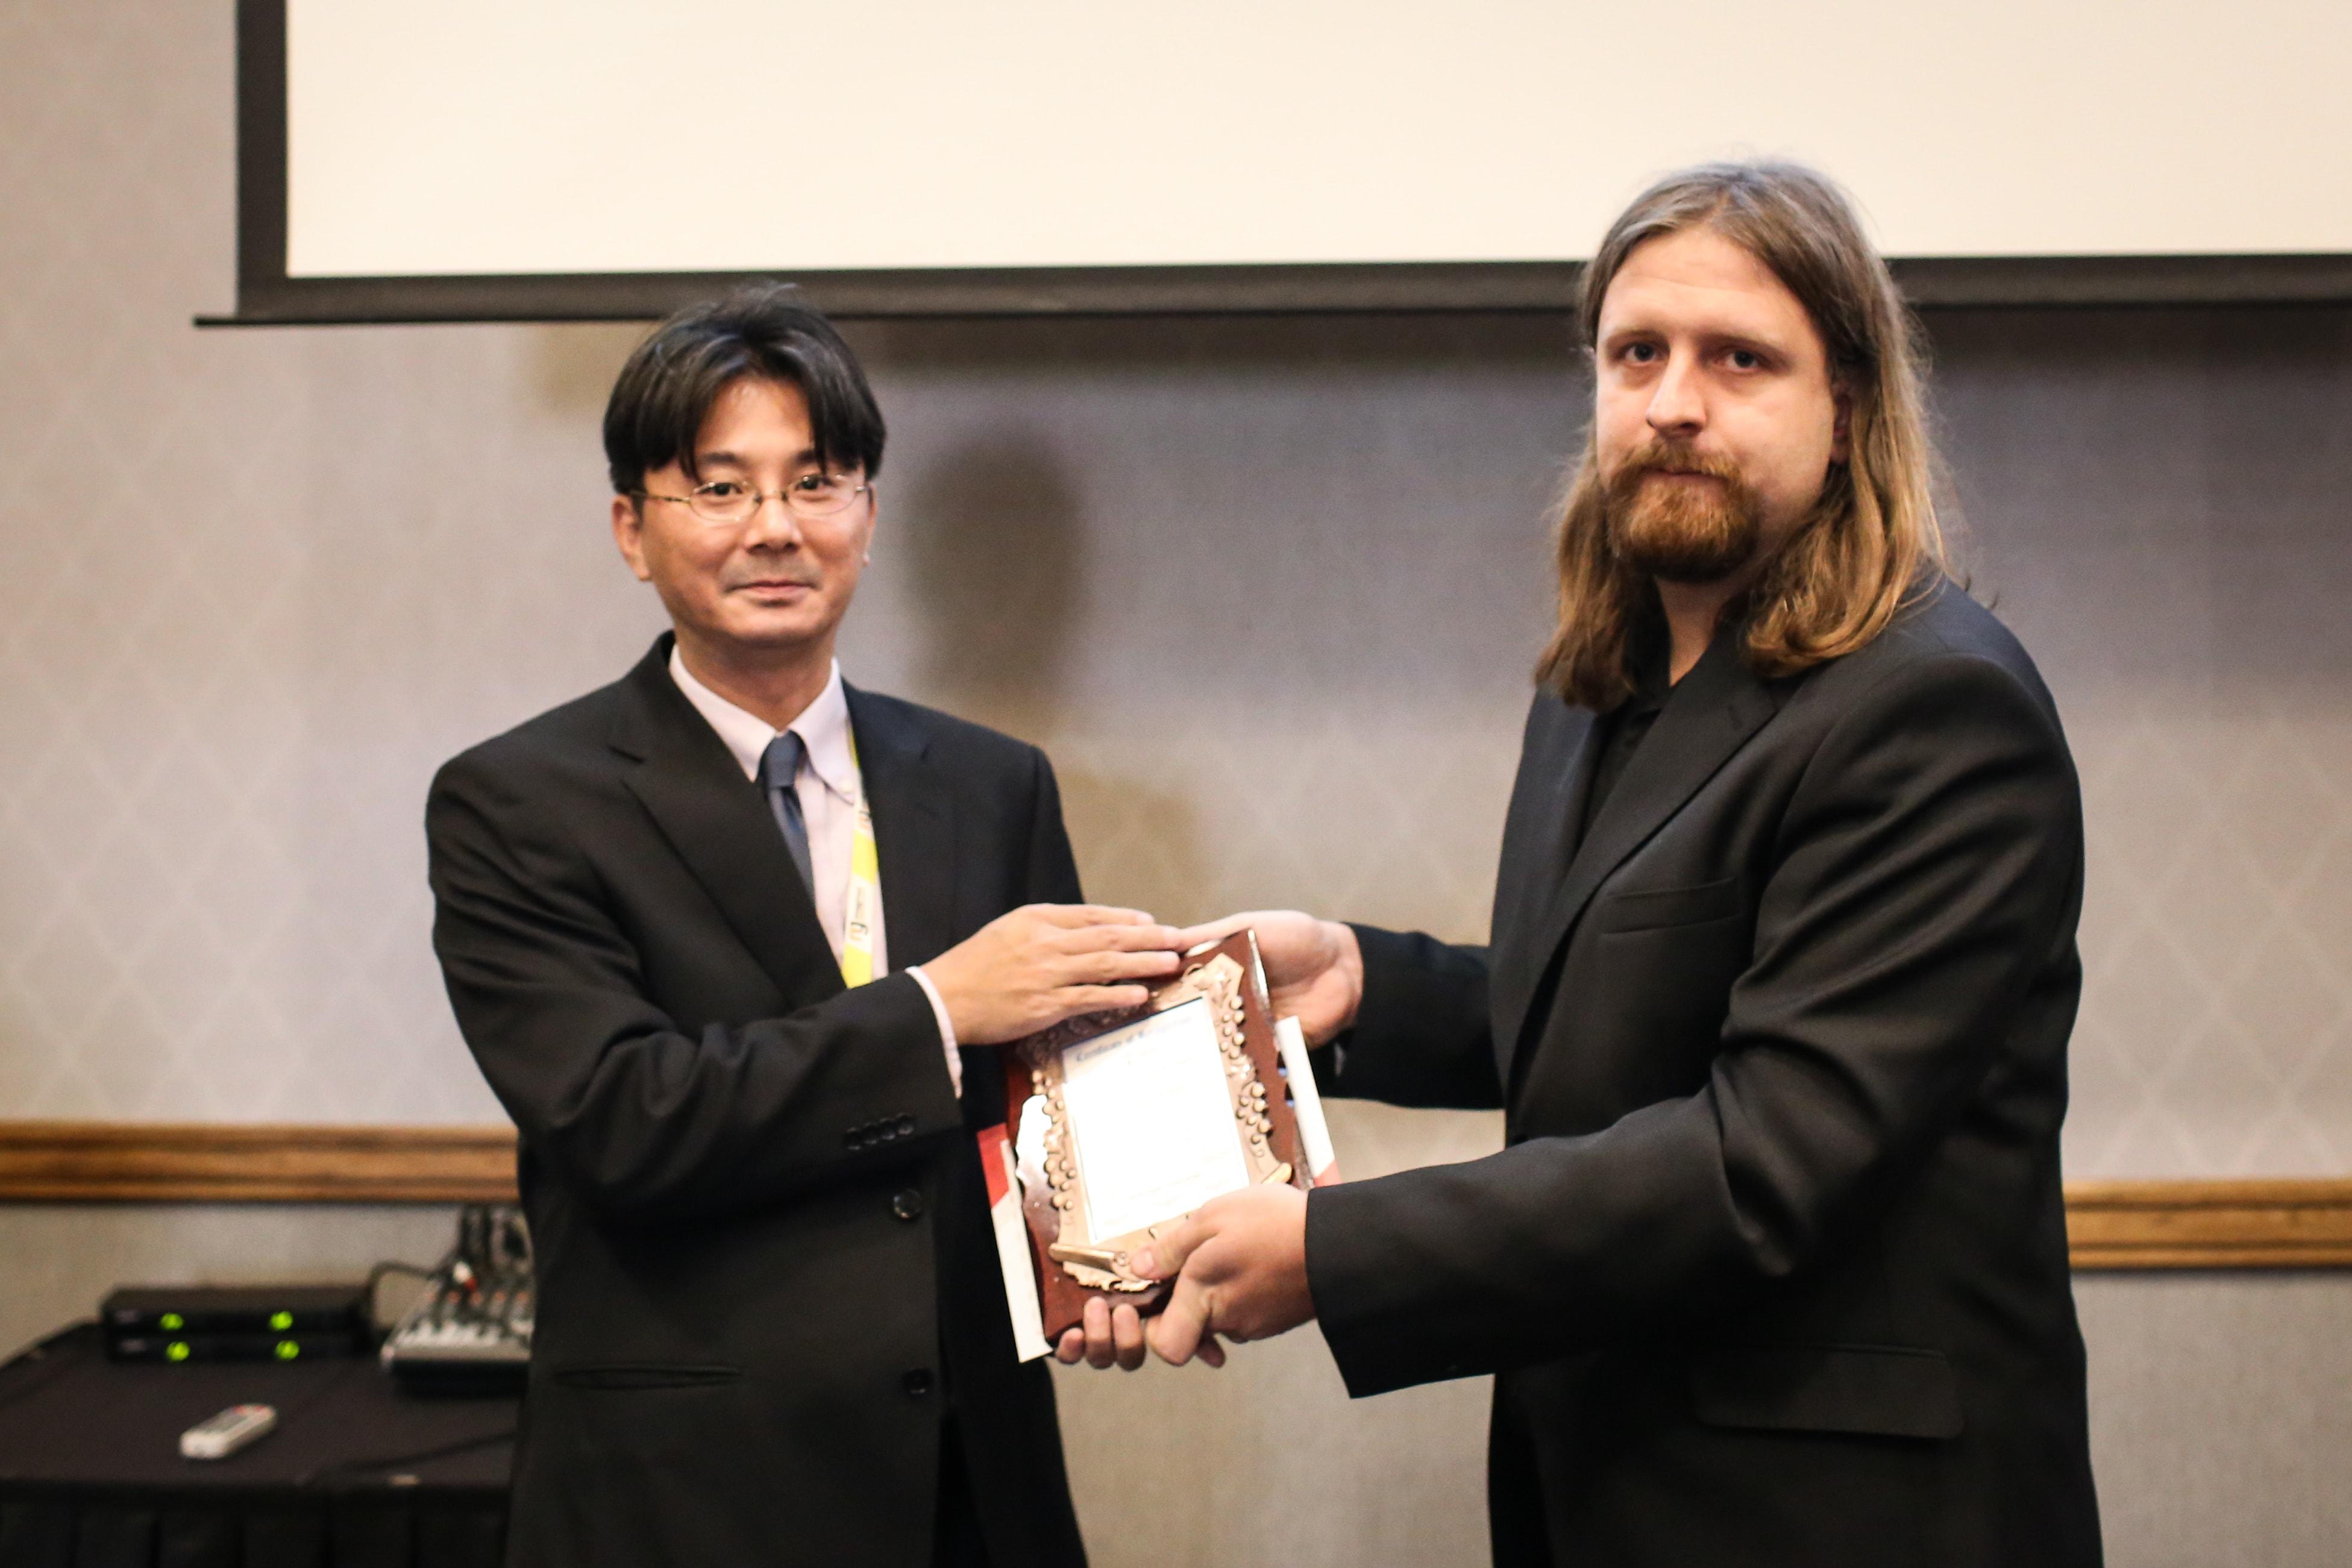 Kenichi Komura felicitated by Jiri Tuma